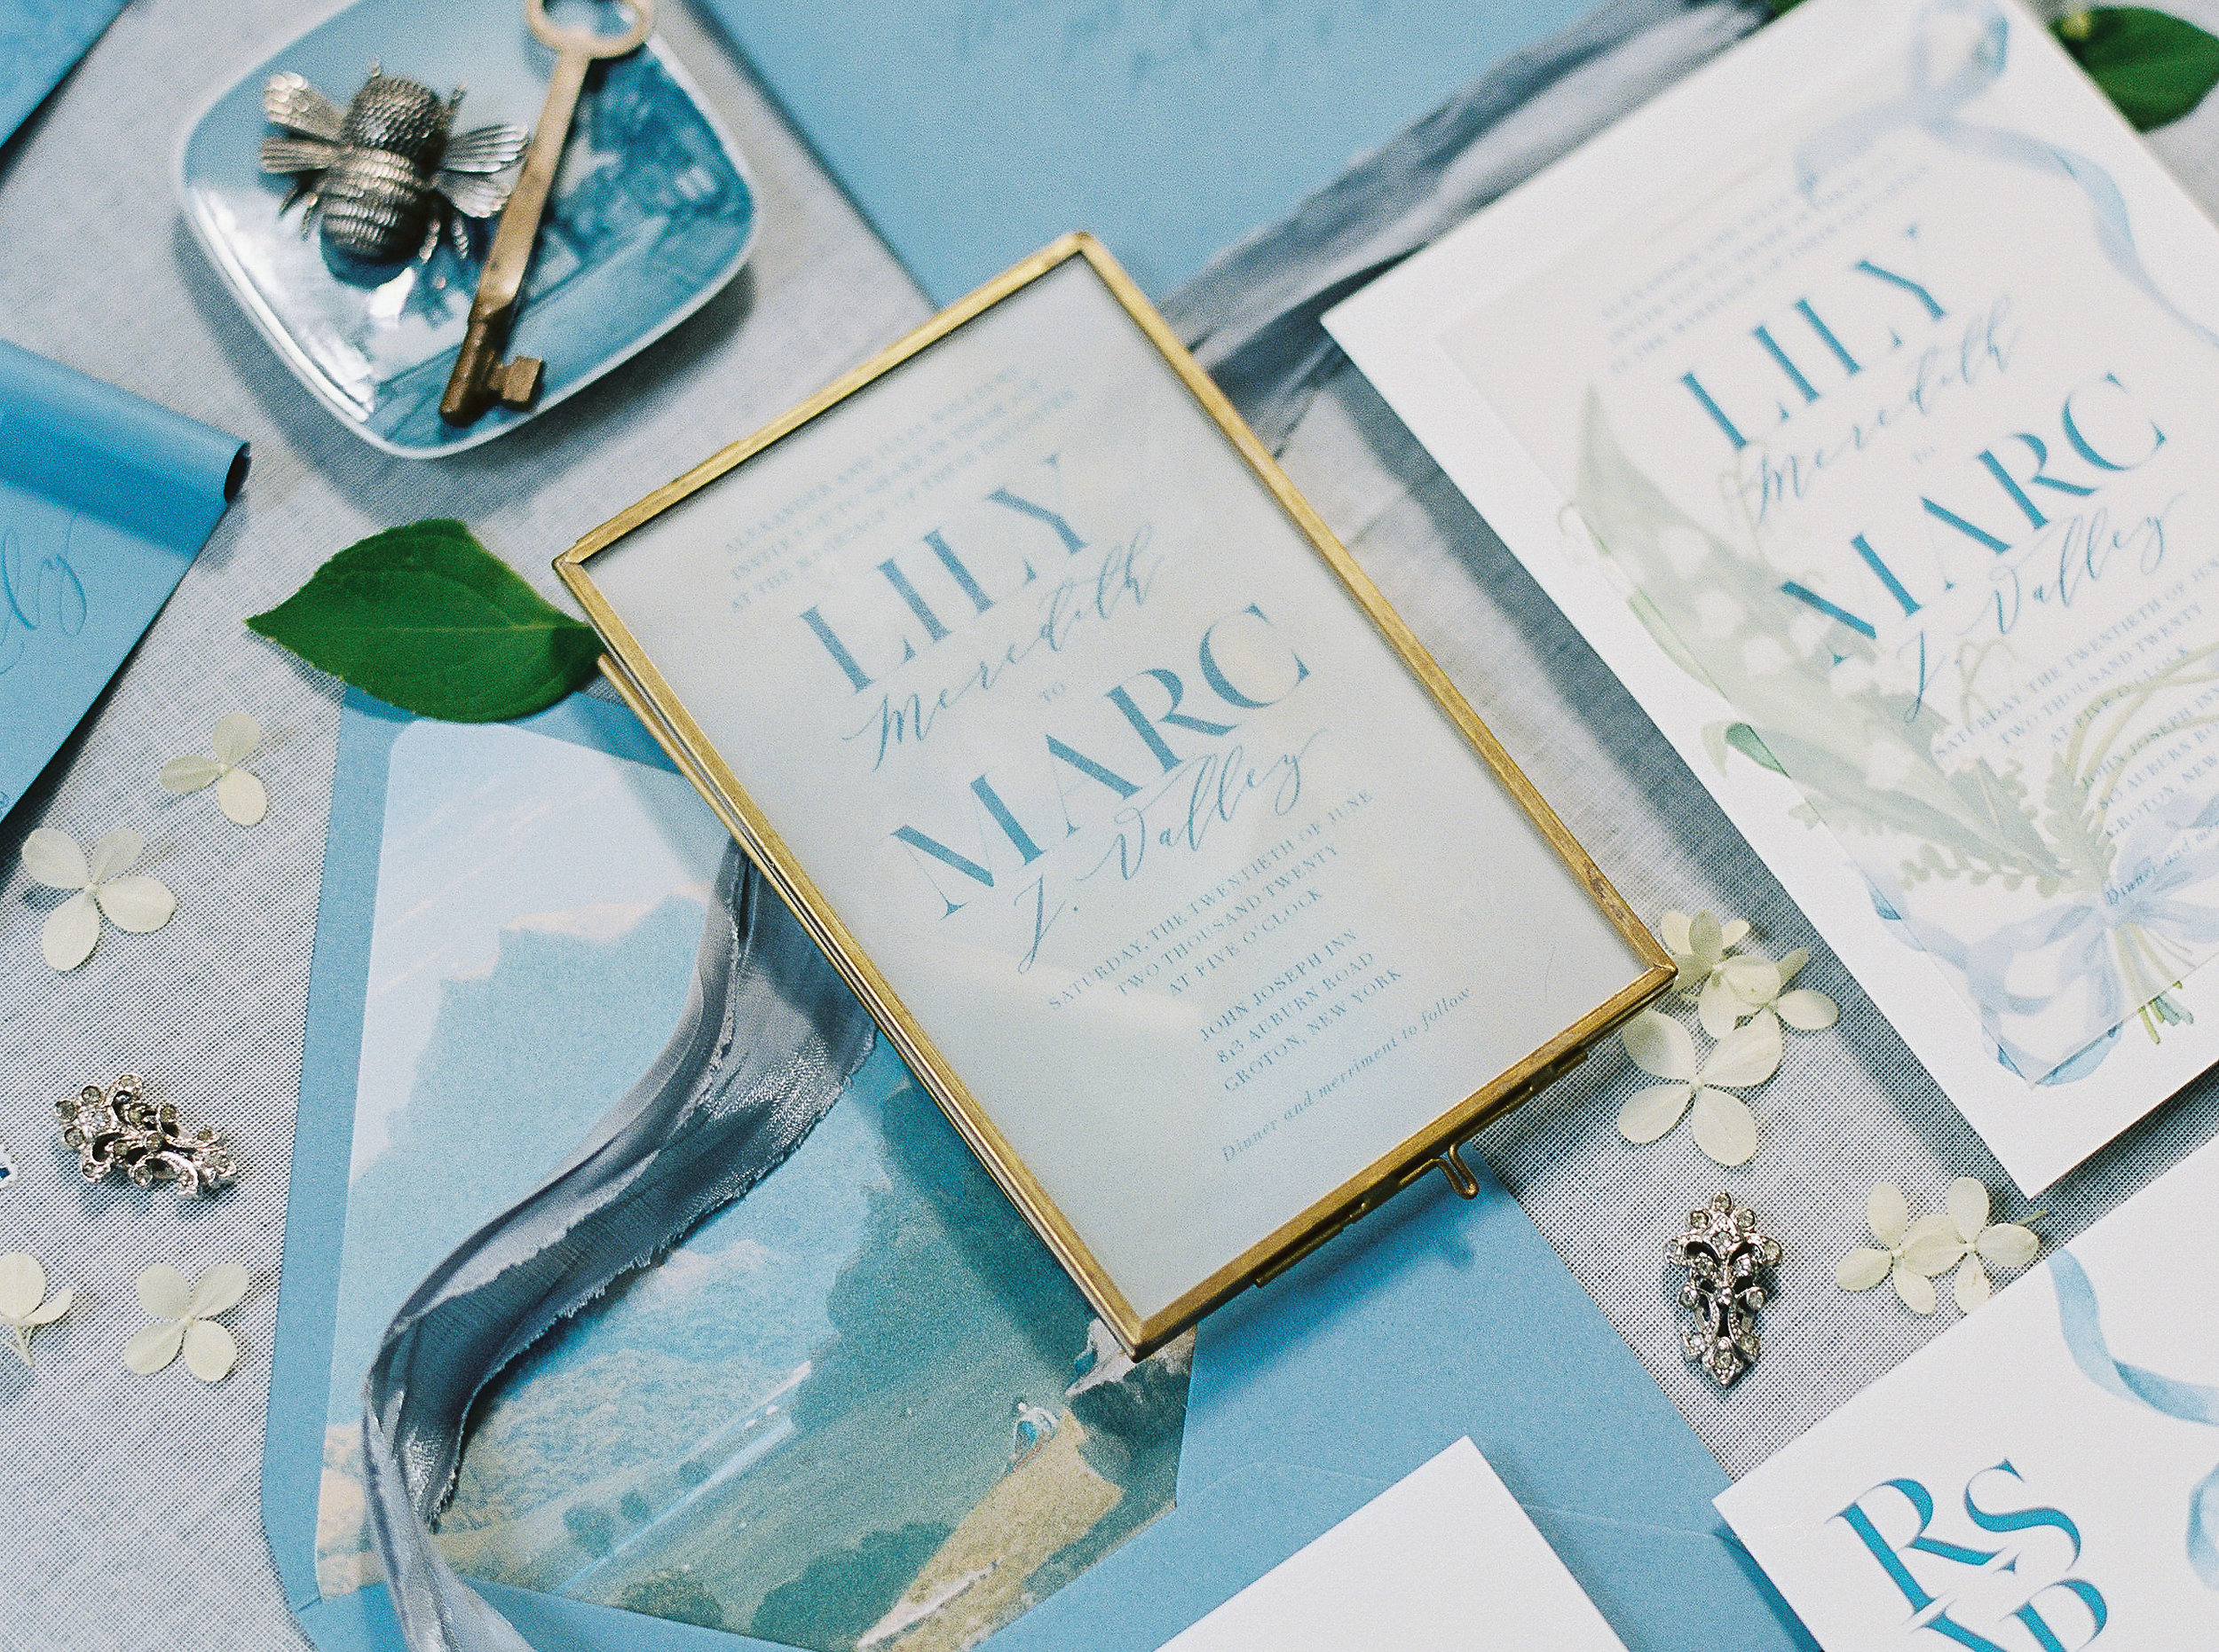 Alexandra-Elise-Photography-Film-Branding-Photographer-Rochester-New-York-Stone-Fruit-Studio-Wedding-Invitations-021.jpg